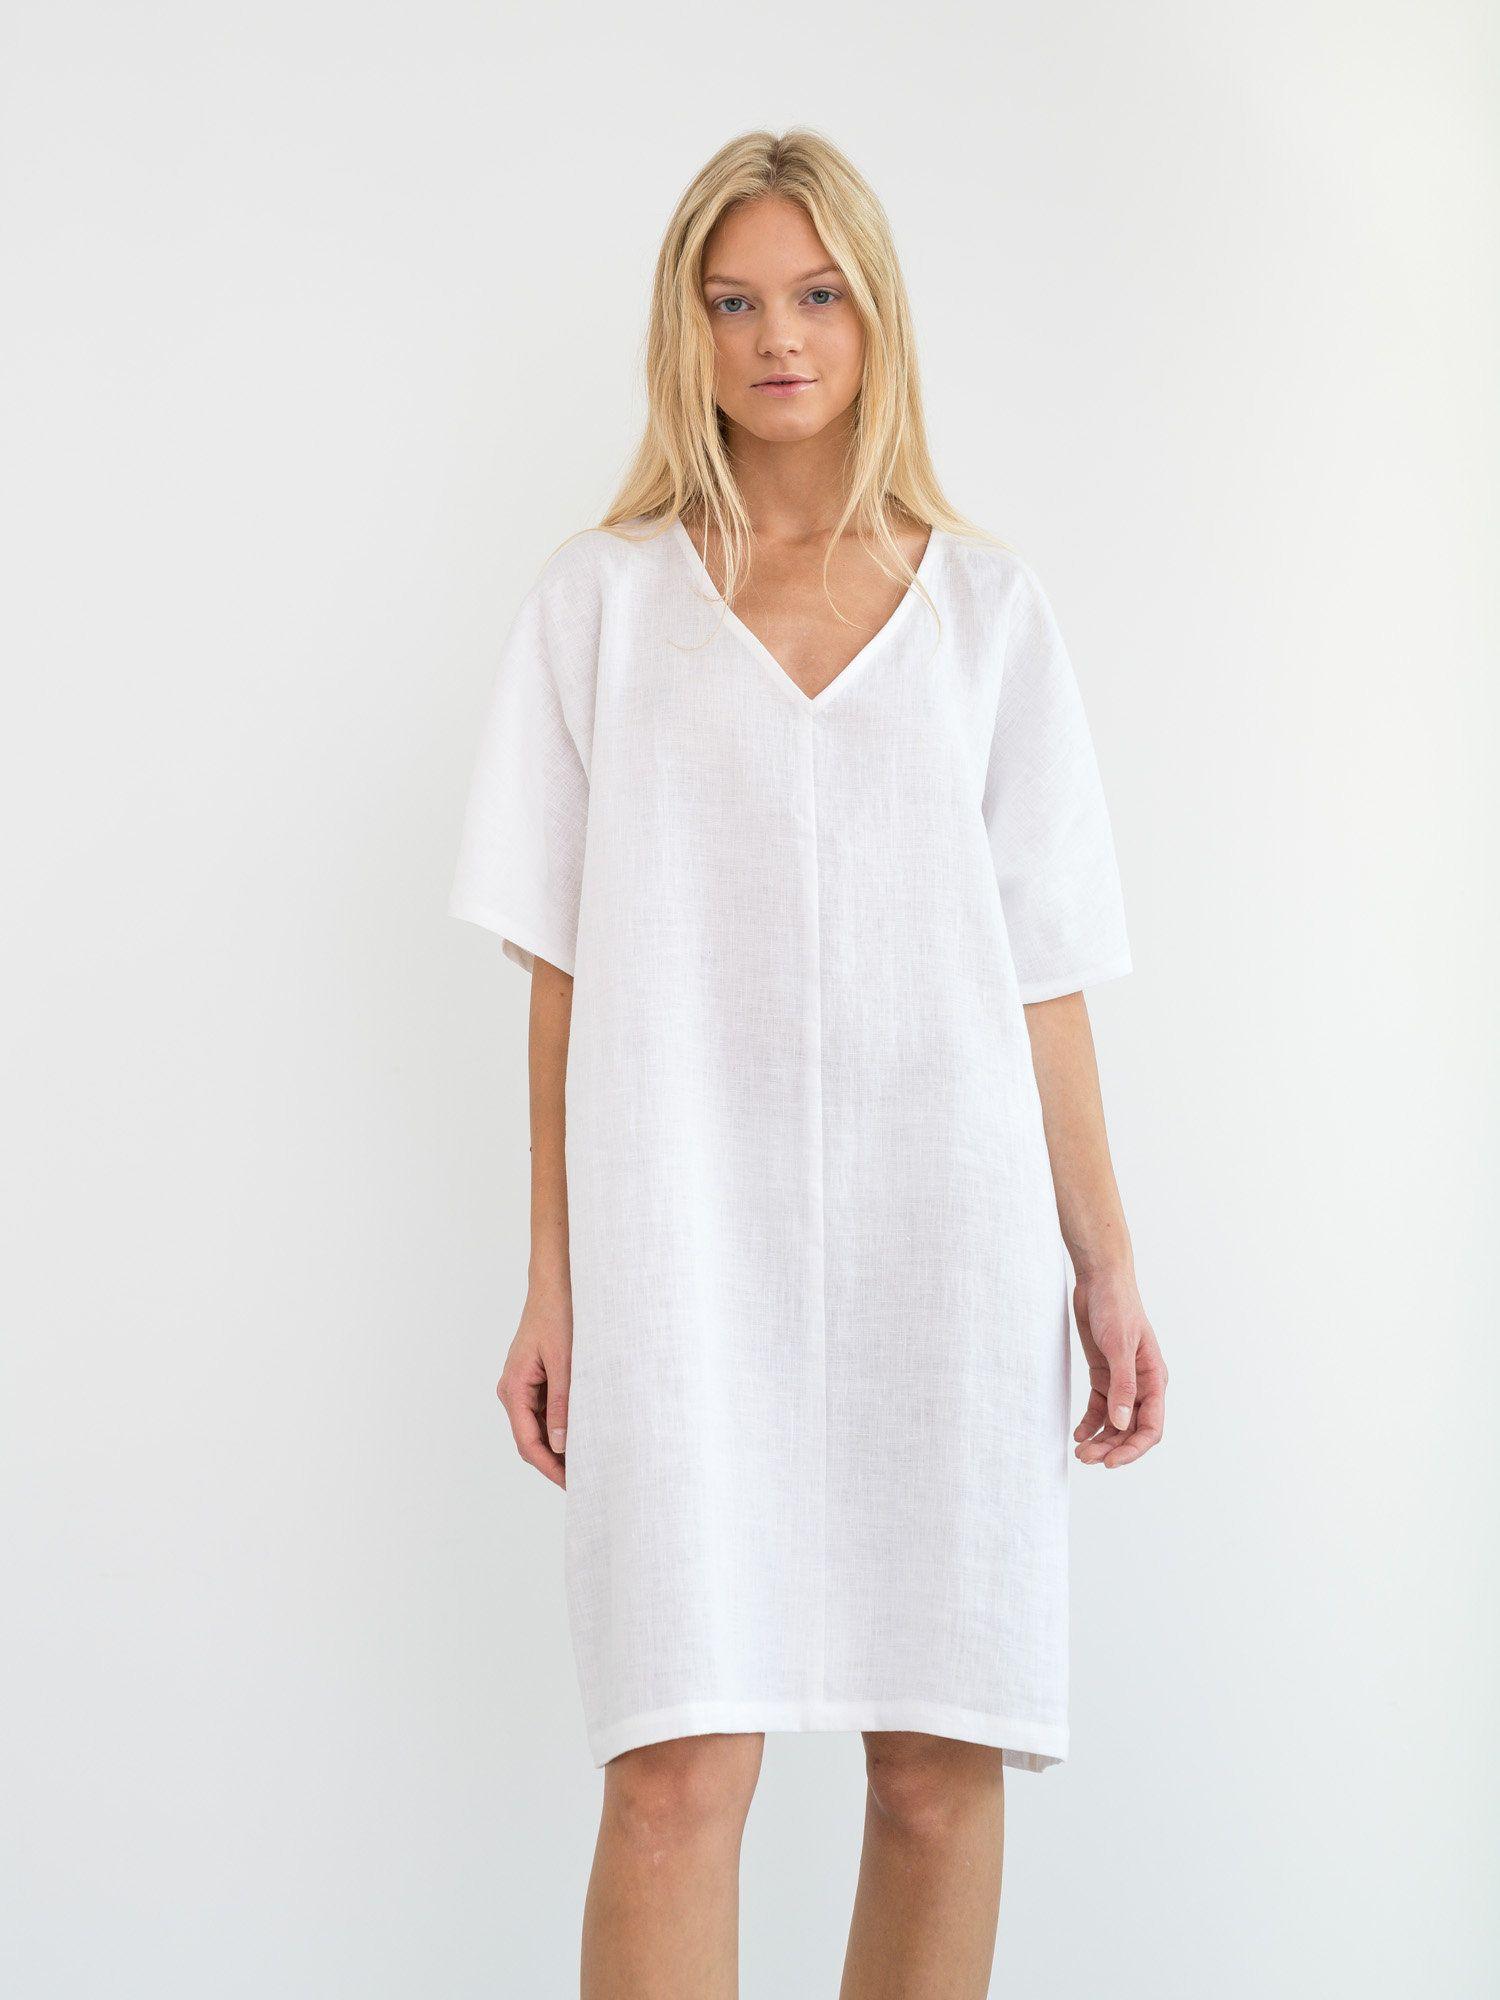 Peony Linen Dress White Oversized Simple Summer Dress Etsy Simple Summer Dresses Summer Dresses Linen Dress [ 2000 x 1500 Pixel ]